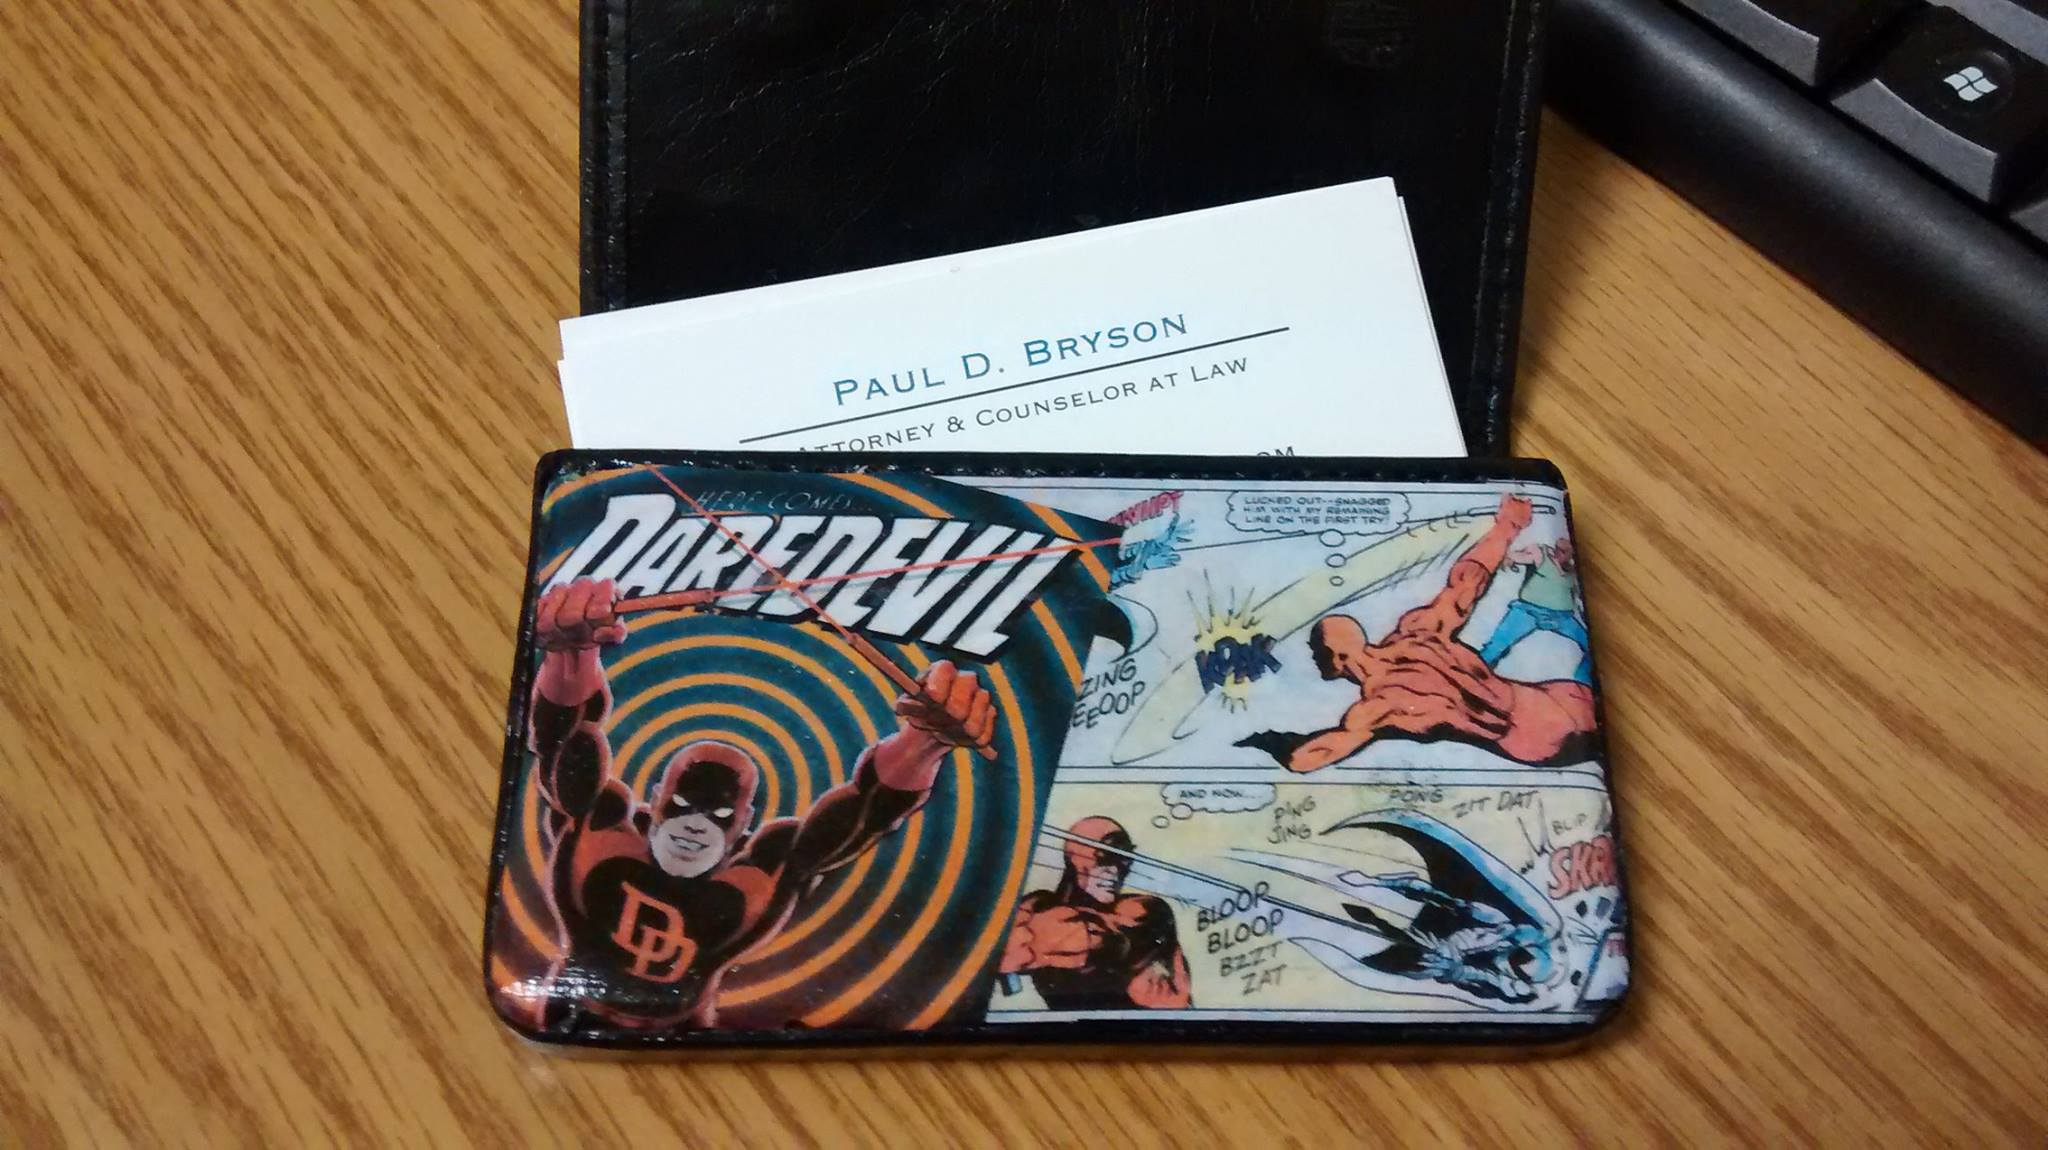 Comic book pop culture business card holder kella geeks online comic book pop culture business card holder colourmoves